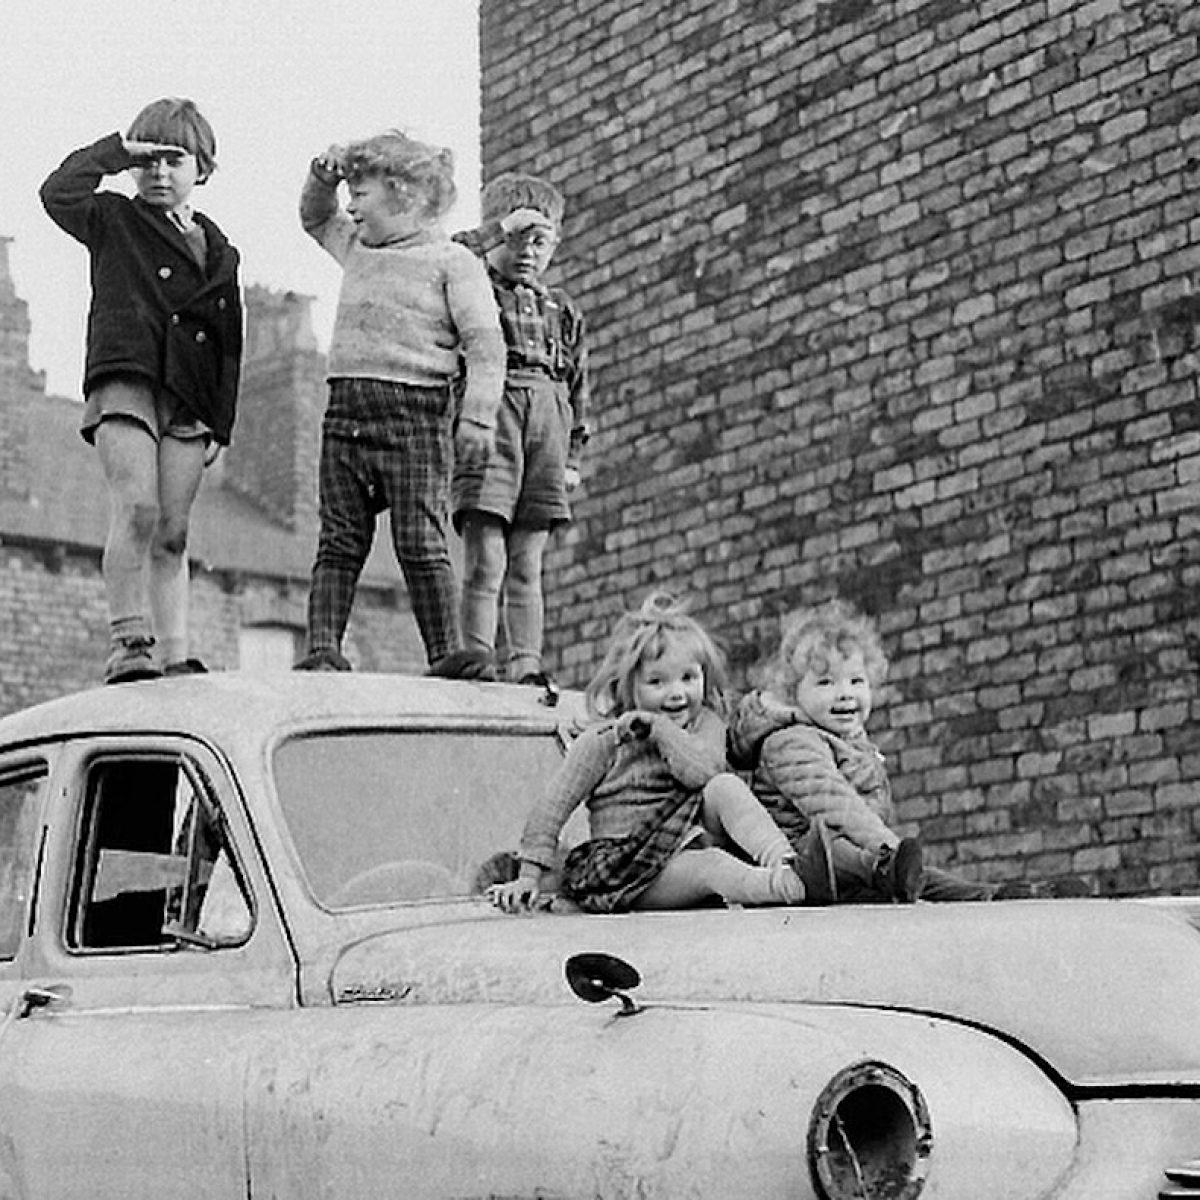 Salford, 1960s.